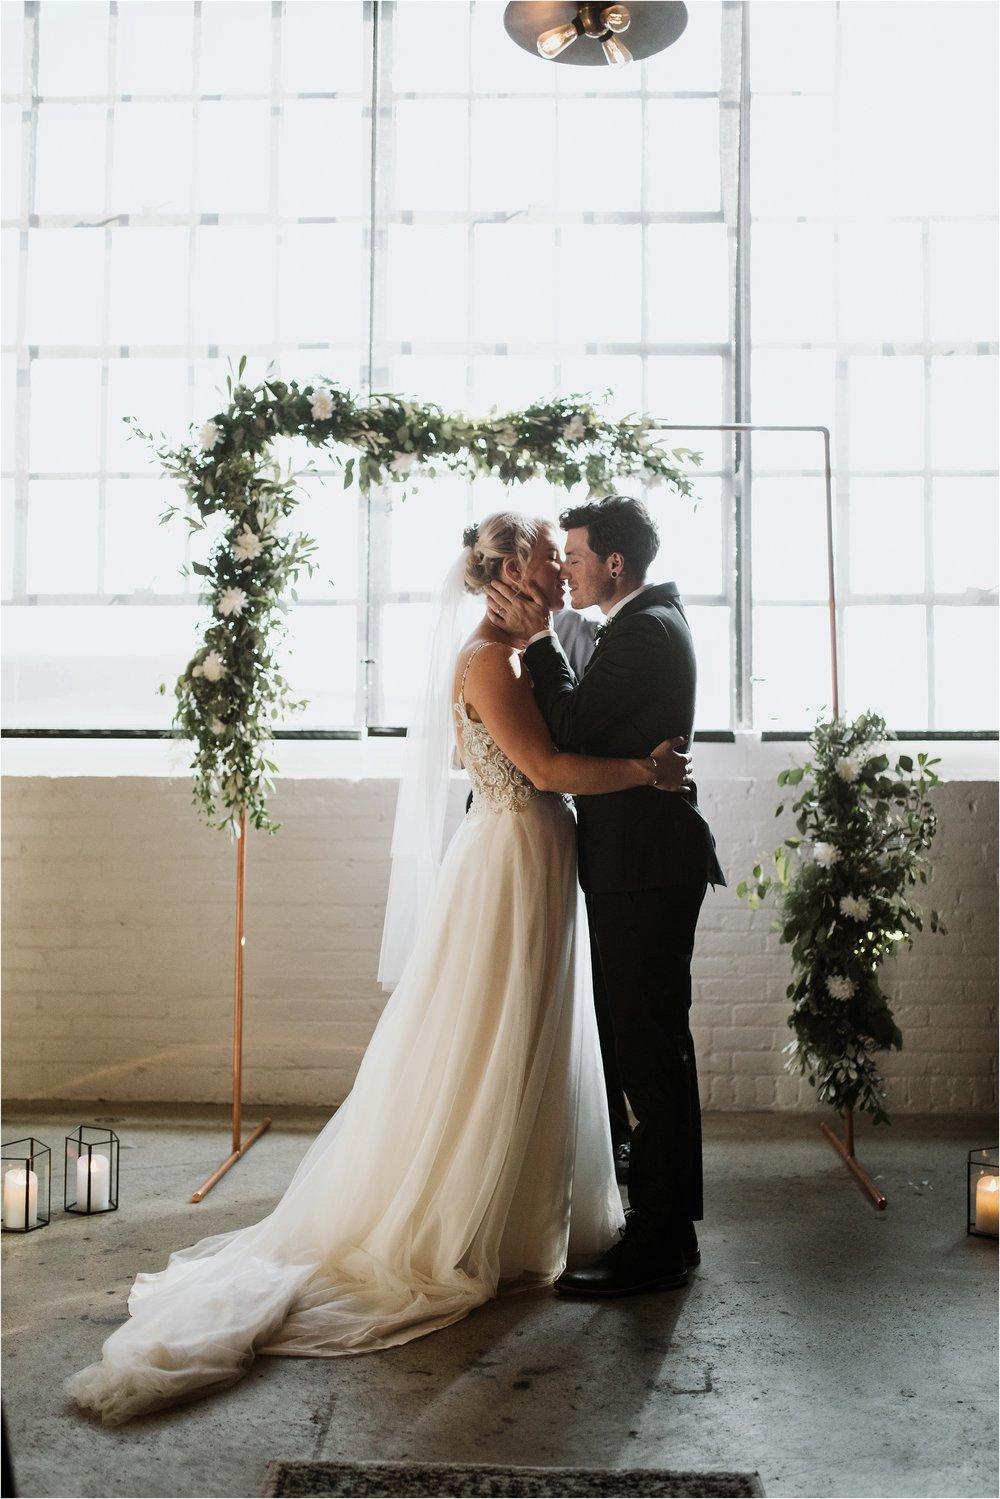 the-skeleton-root-wedding-photography-_0020.jpg